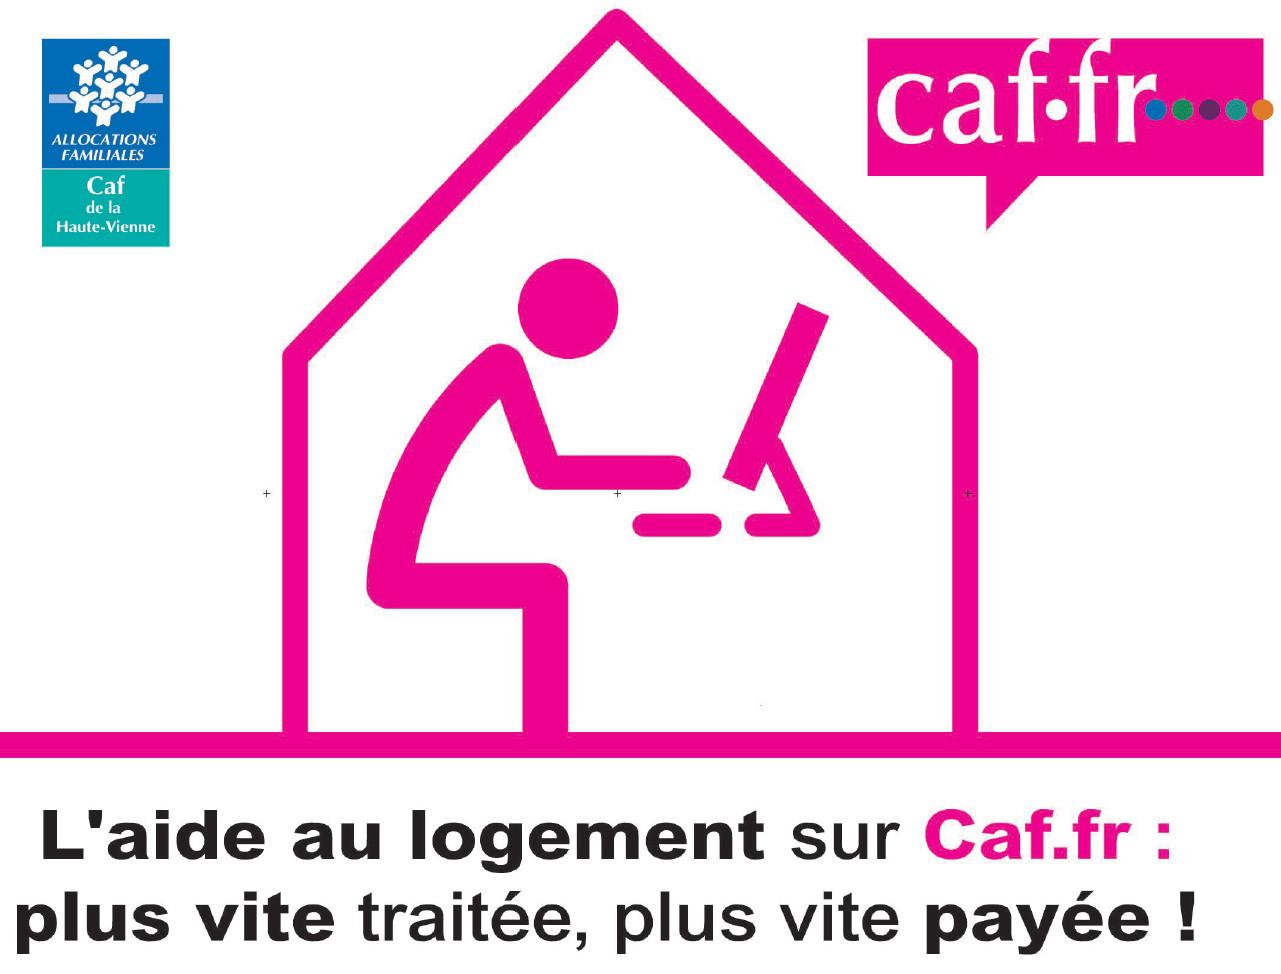 Aide Logement La Caf Fr